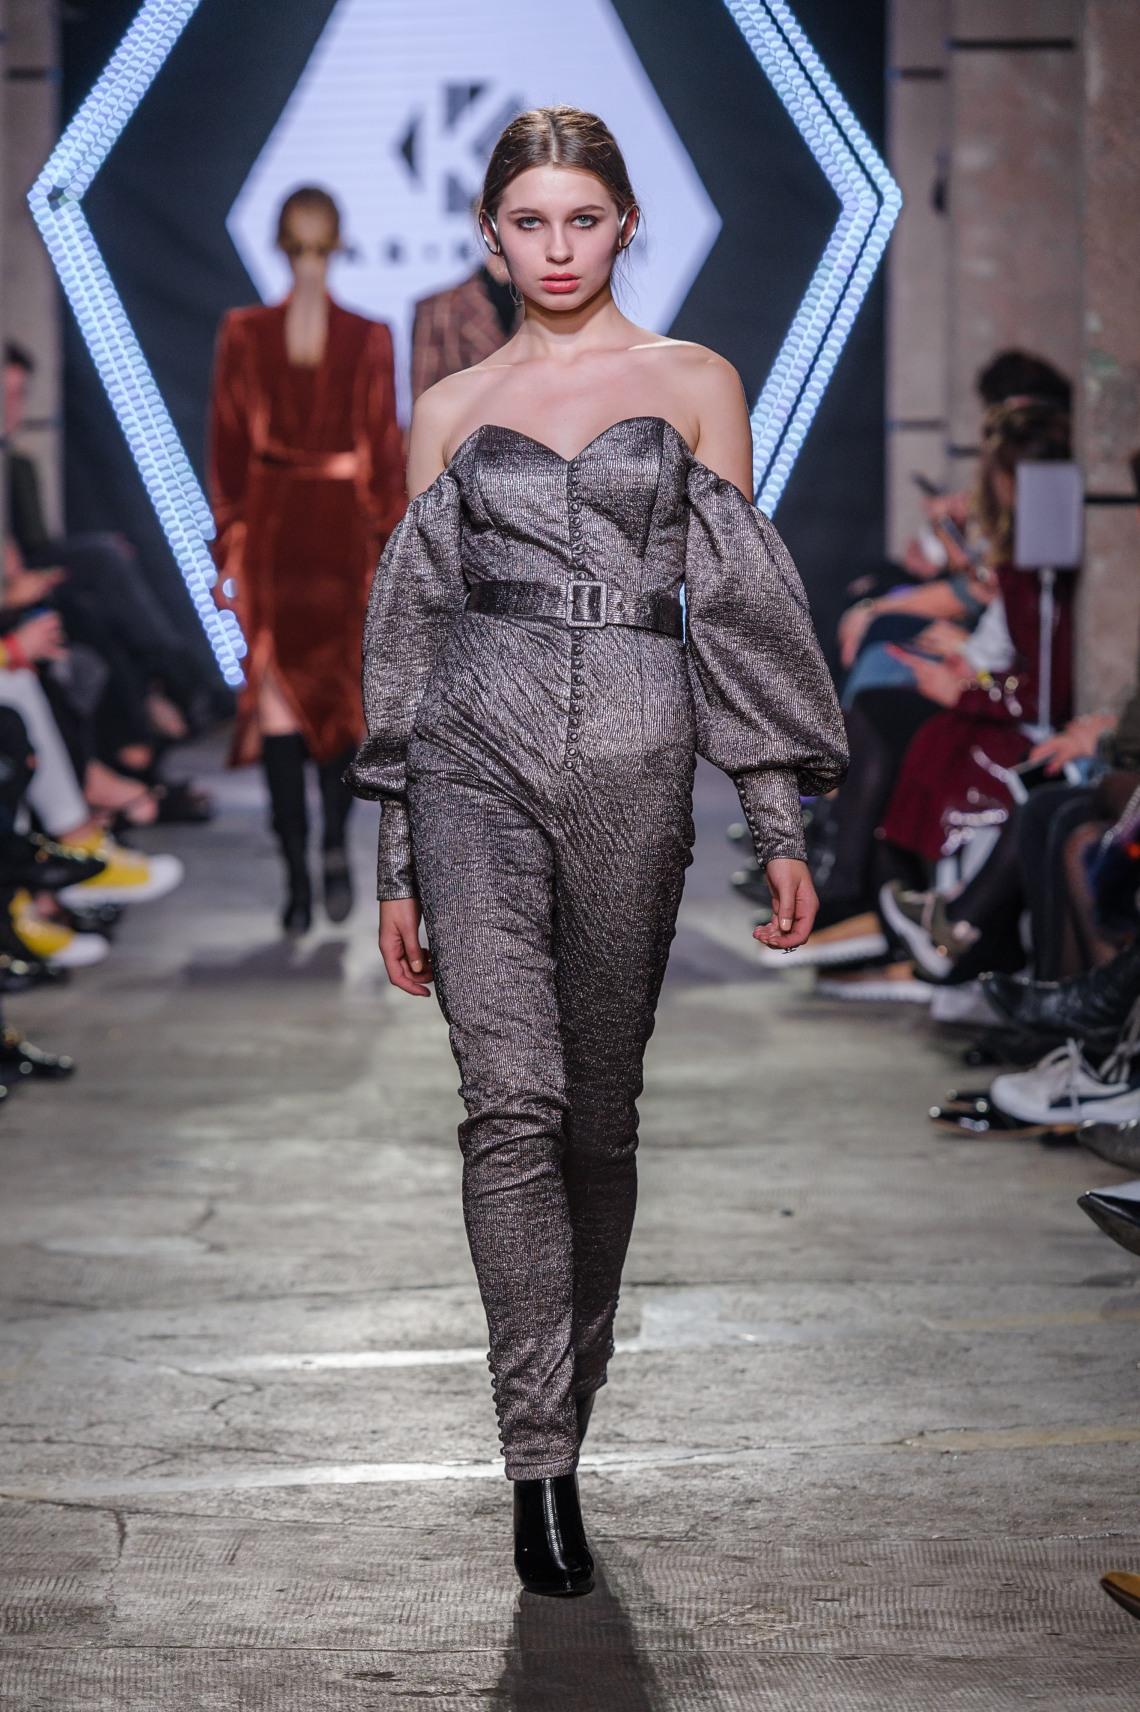 10ktw-101118_15-kaskryst_highres_fotfilipokopny-fashionimages